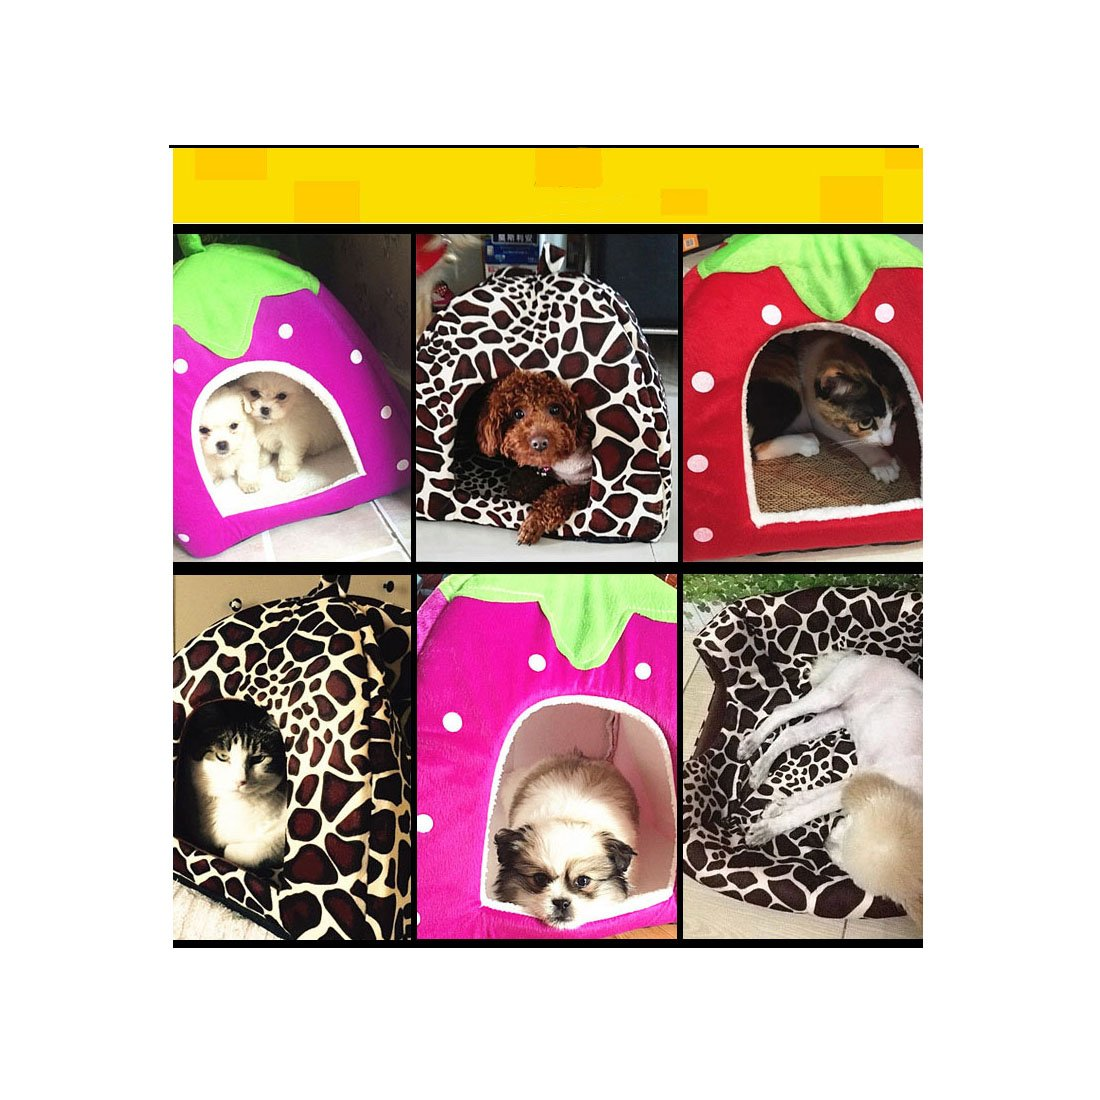 angelakerry mascota perro gato cama Cálido Cojín Casa Fresas Caseta de perro suave cama nueva Varios Tamaño: Amazon.es: Productos para mascotas